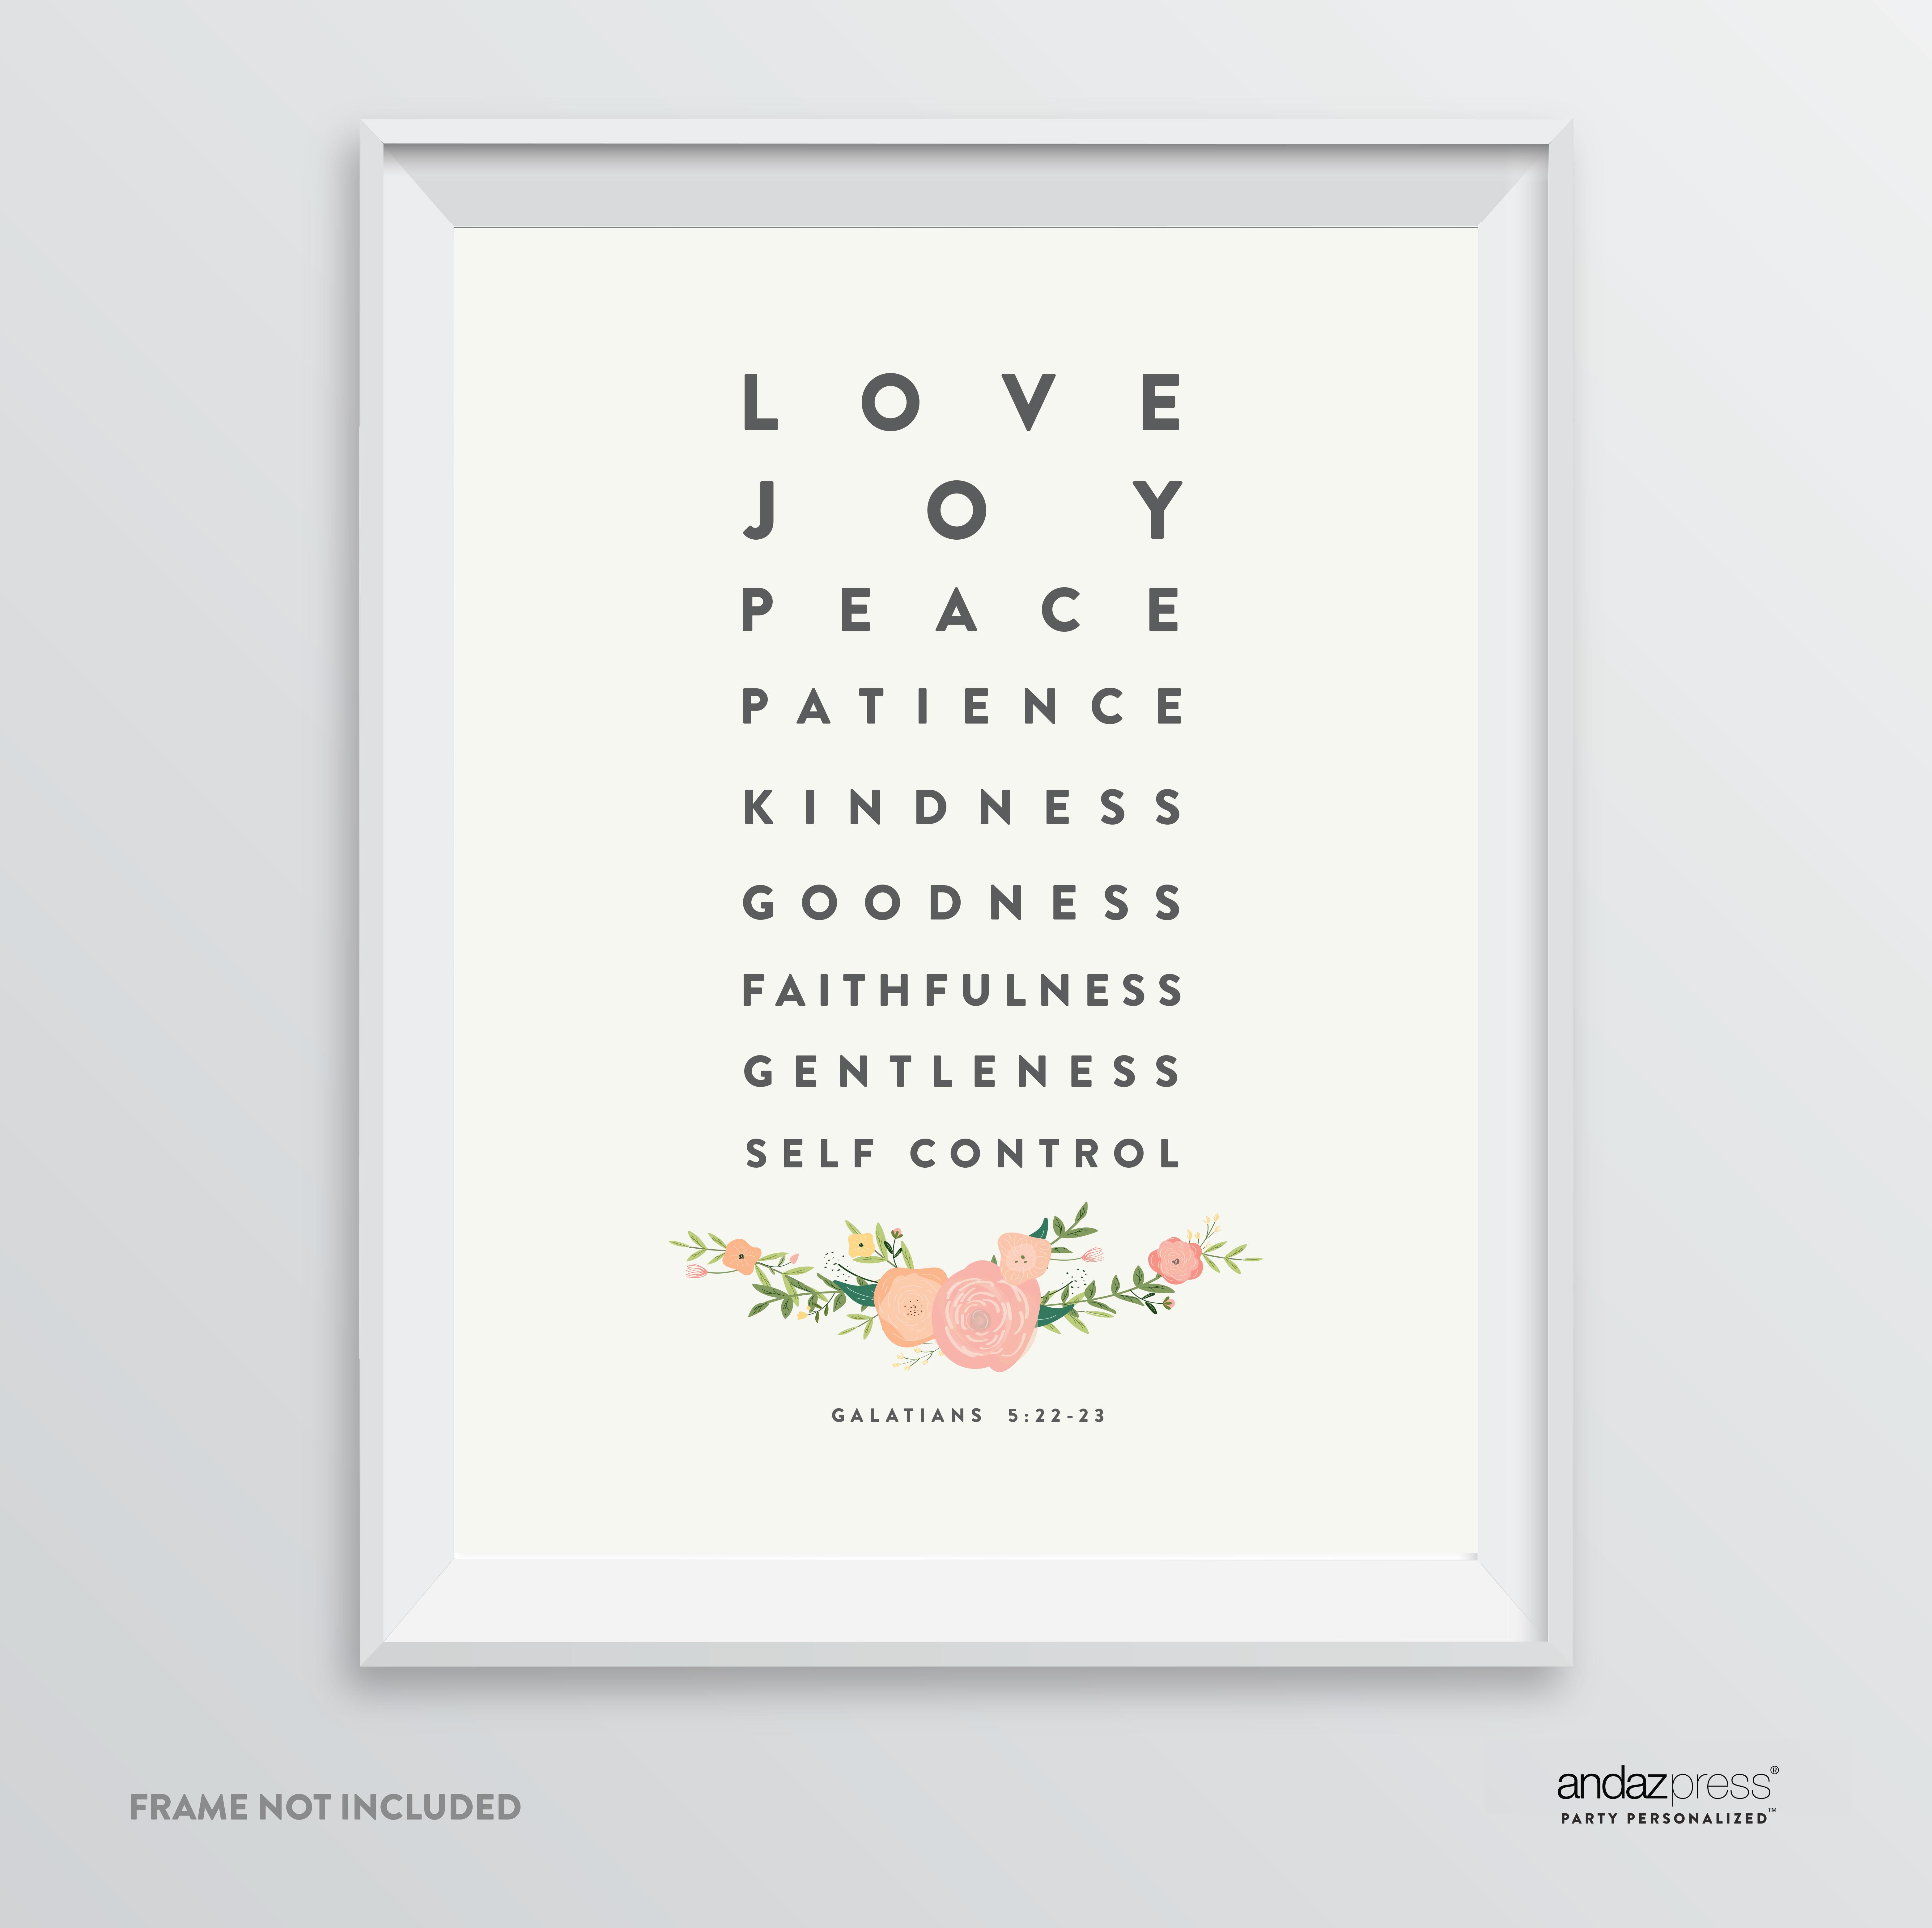 Love Joy Peace Patience Kindness Galatians 5 22 23 Bible Verses